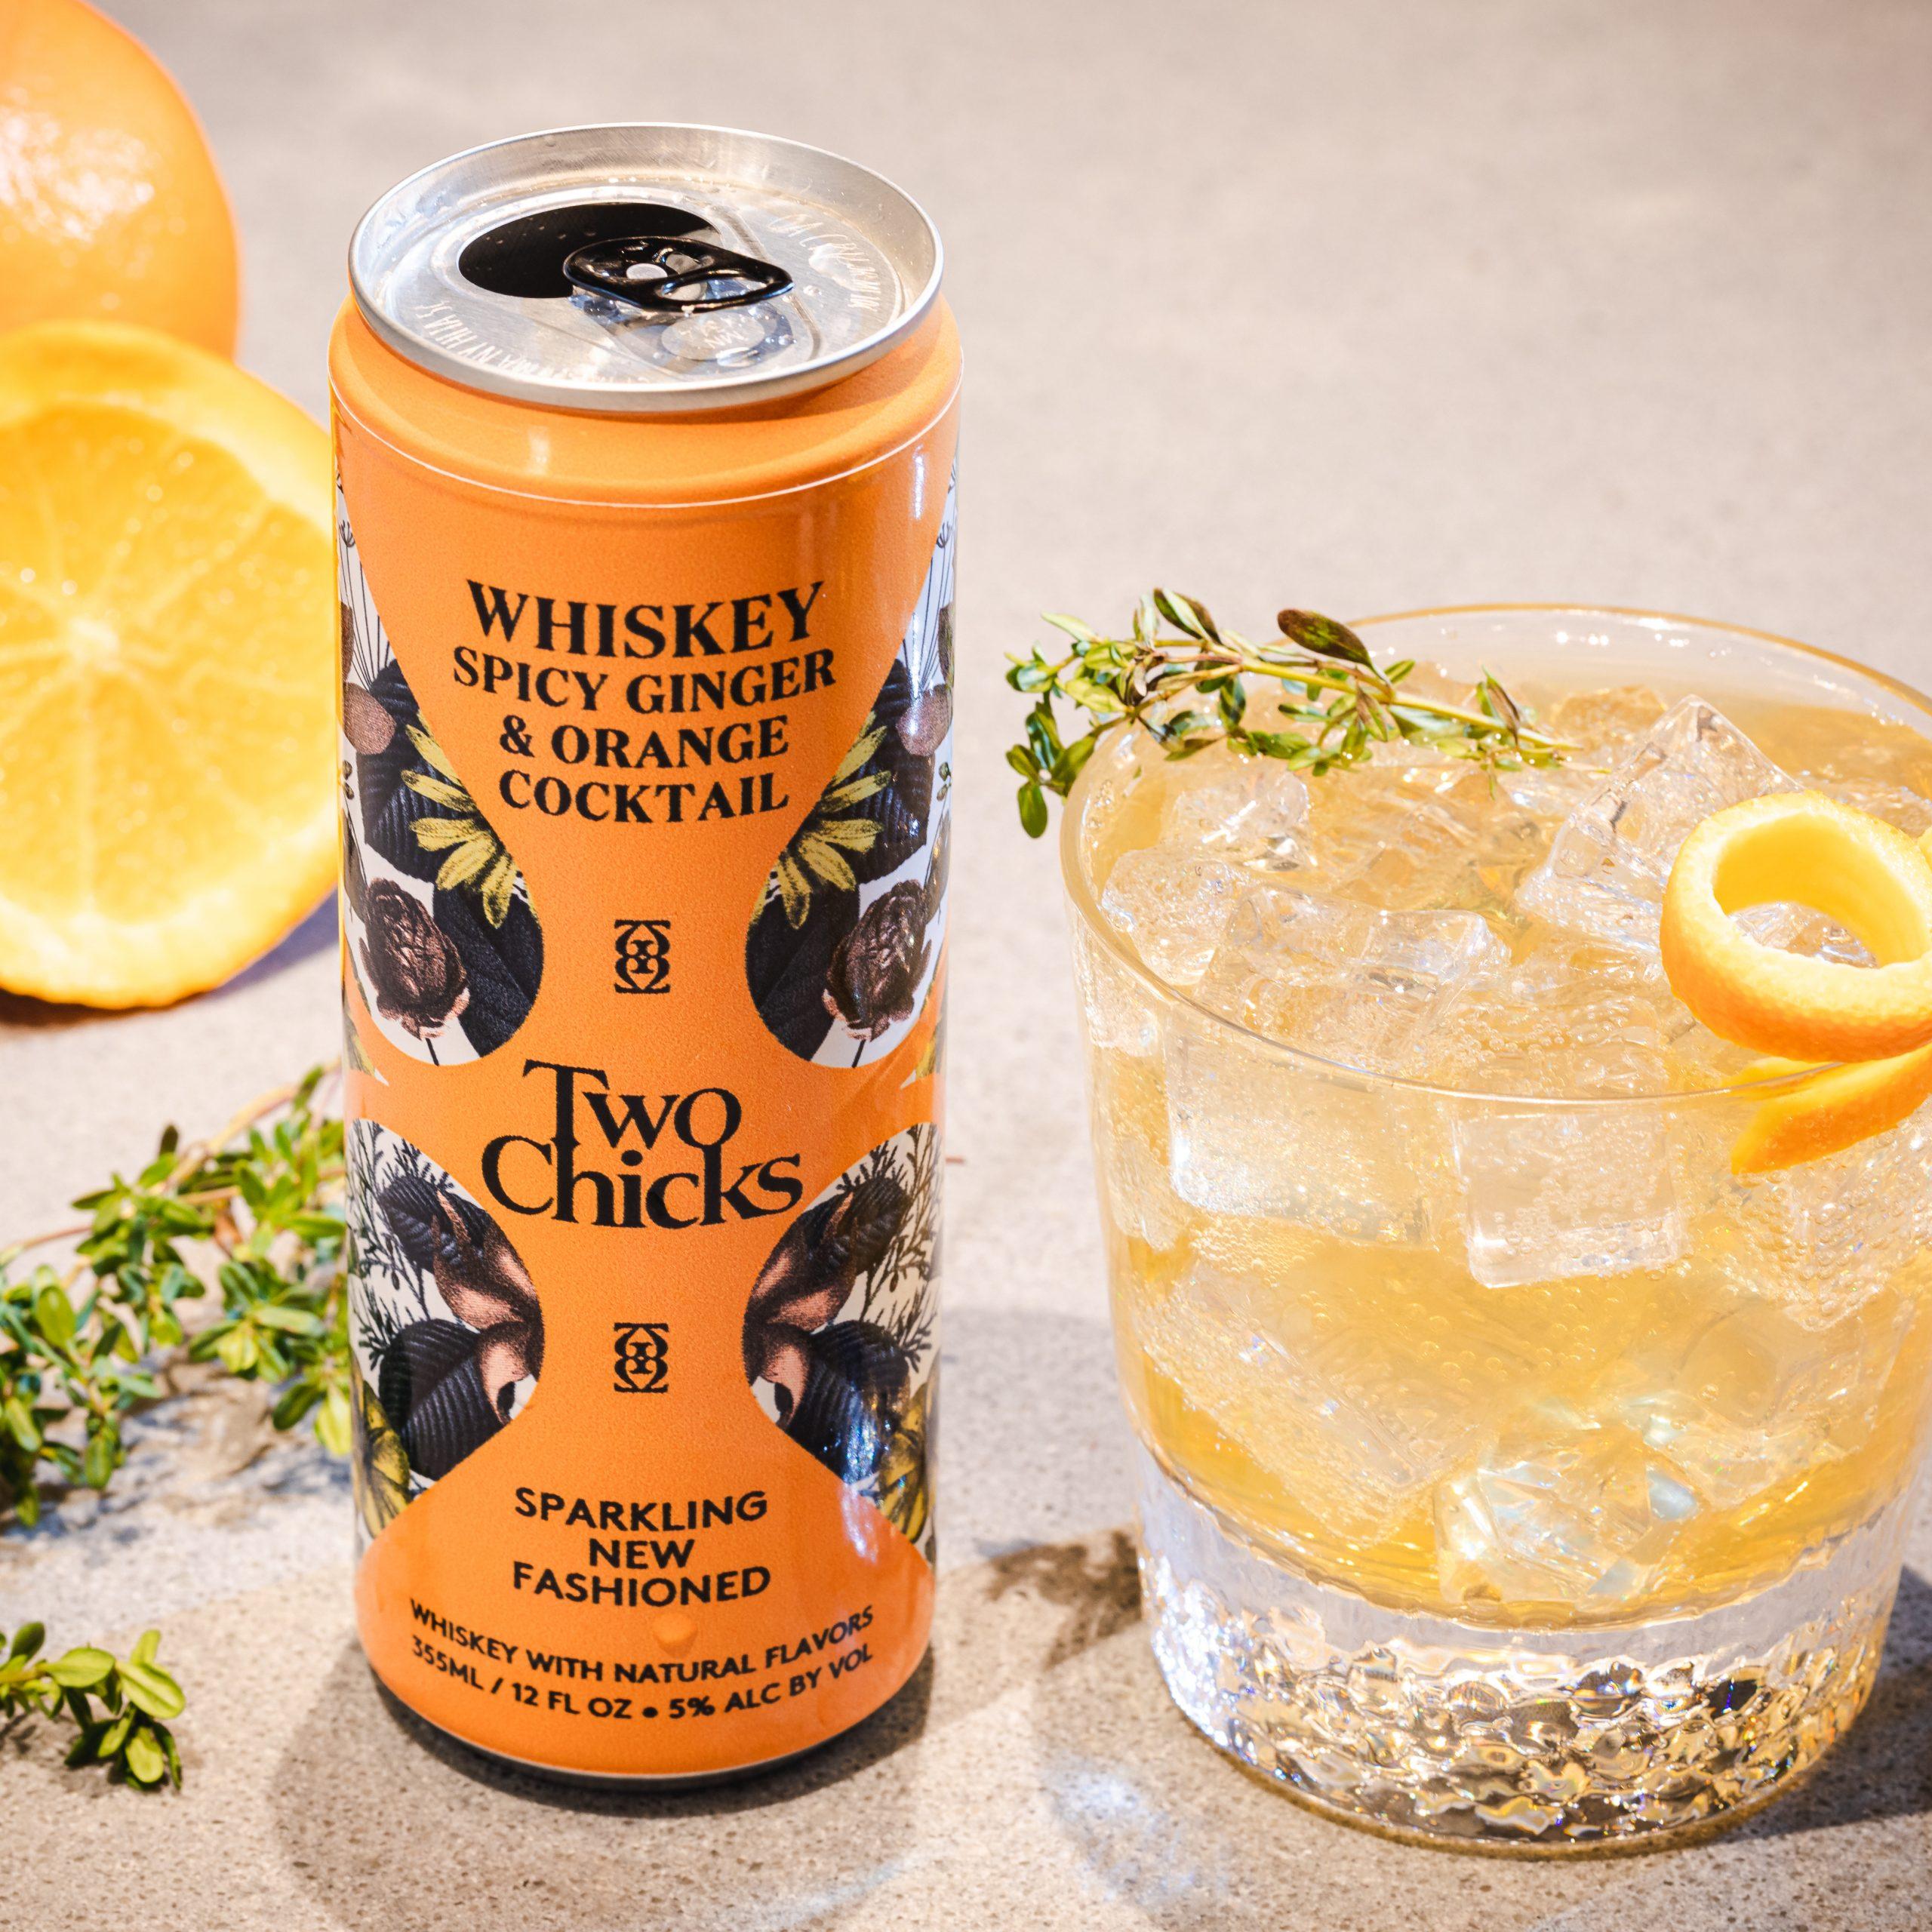 TCC_Whiskey New Fashioned_5451-1